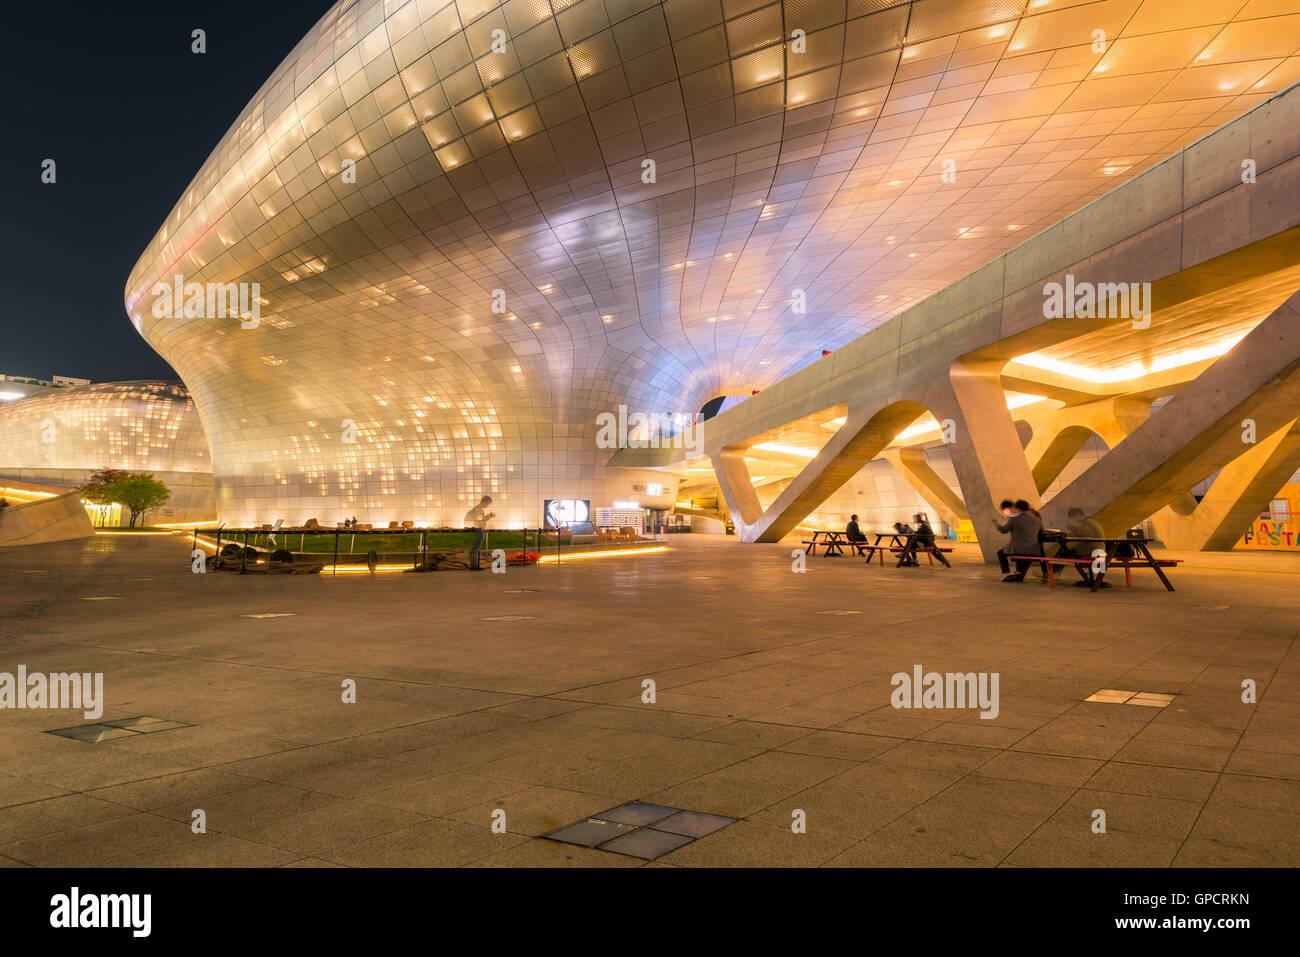 Diseño de Dongdaemun Plaza,en Seúl, Corea. Imagen De Stock